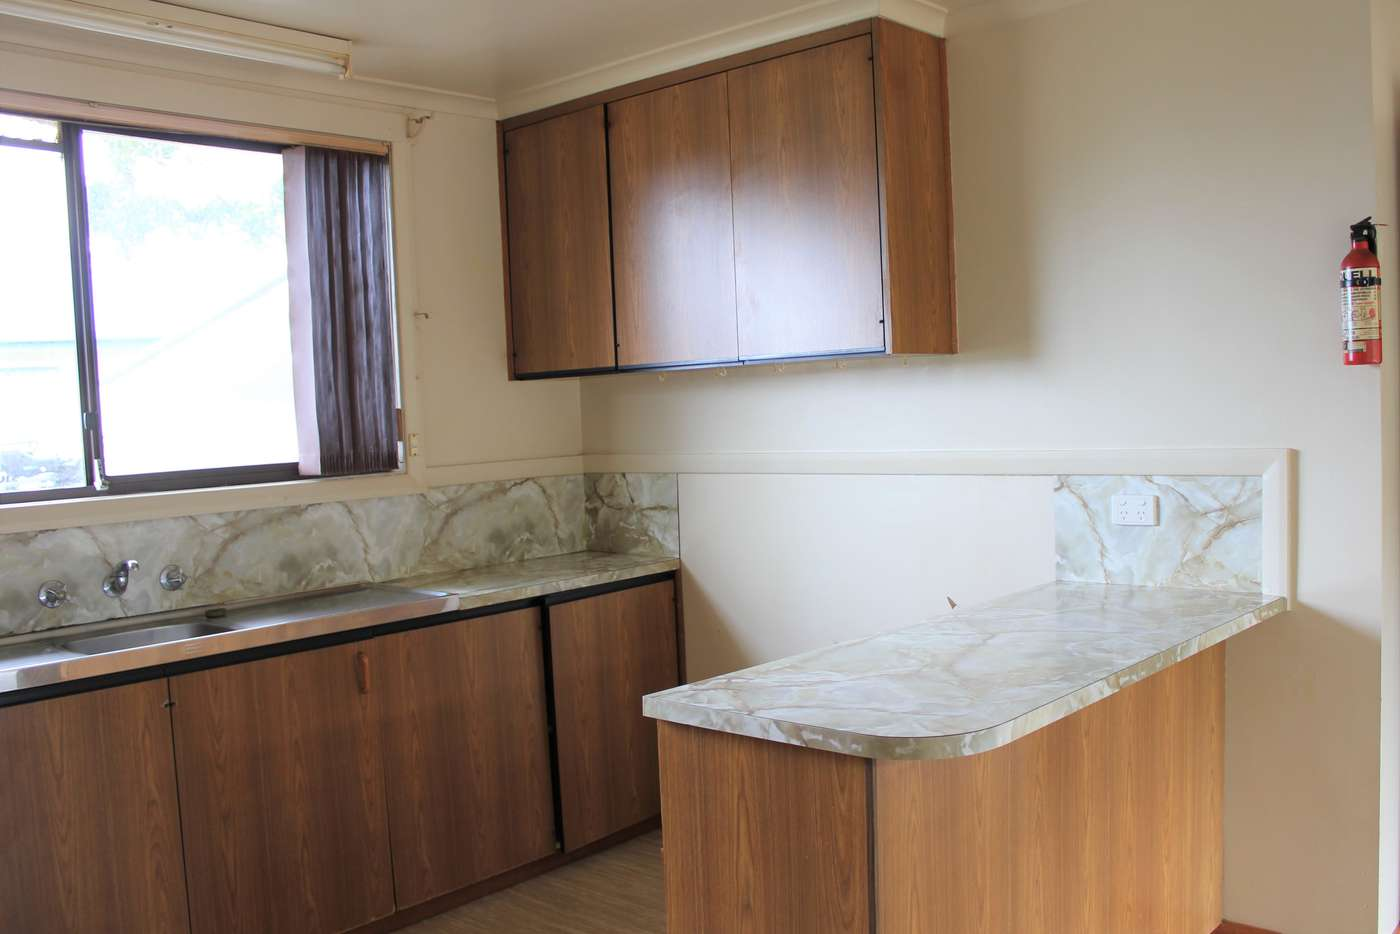 Sixth view of Homely house listing, 17 Shield Street, Zeehan TAS 7469